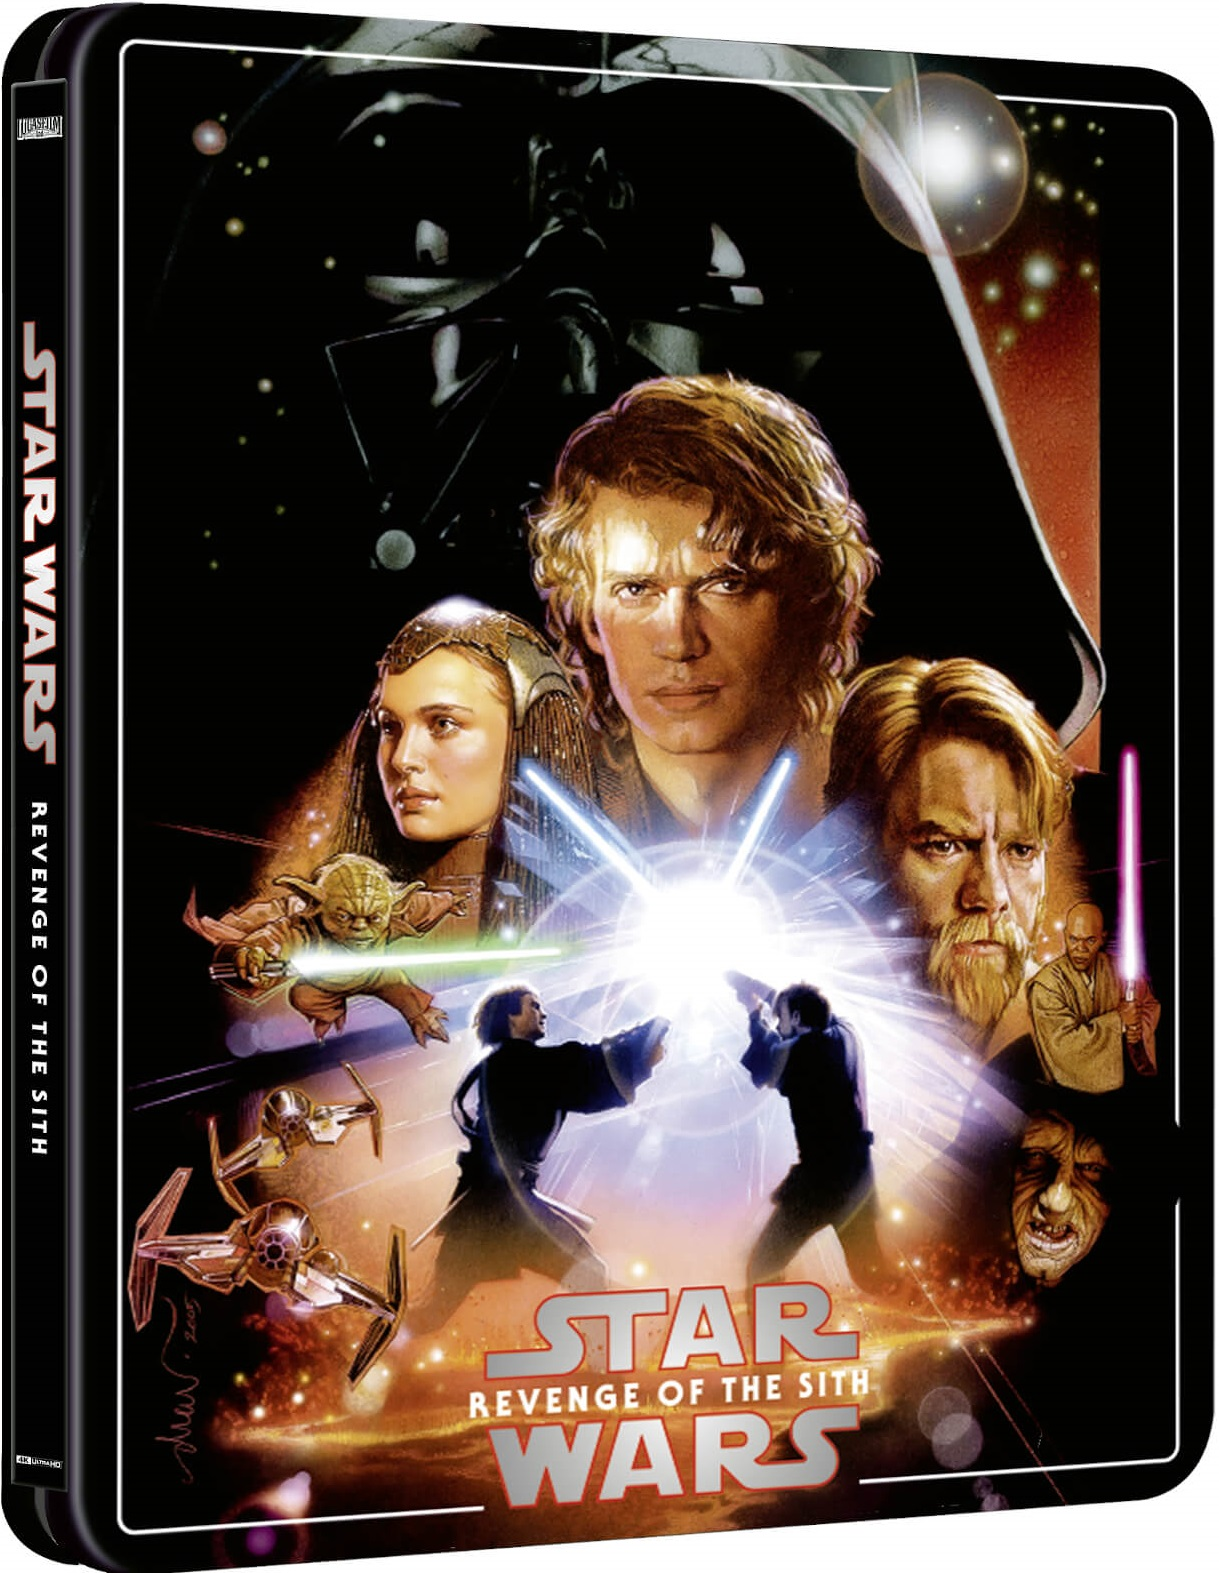 Sci Fi Prequel Trilogy Closer Star Wars Episode Iii Revenge Of The Sith Is Getting A Zavvi Exclusive 4k Steelbook Steelbook Blu Ray News